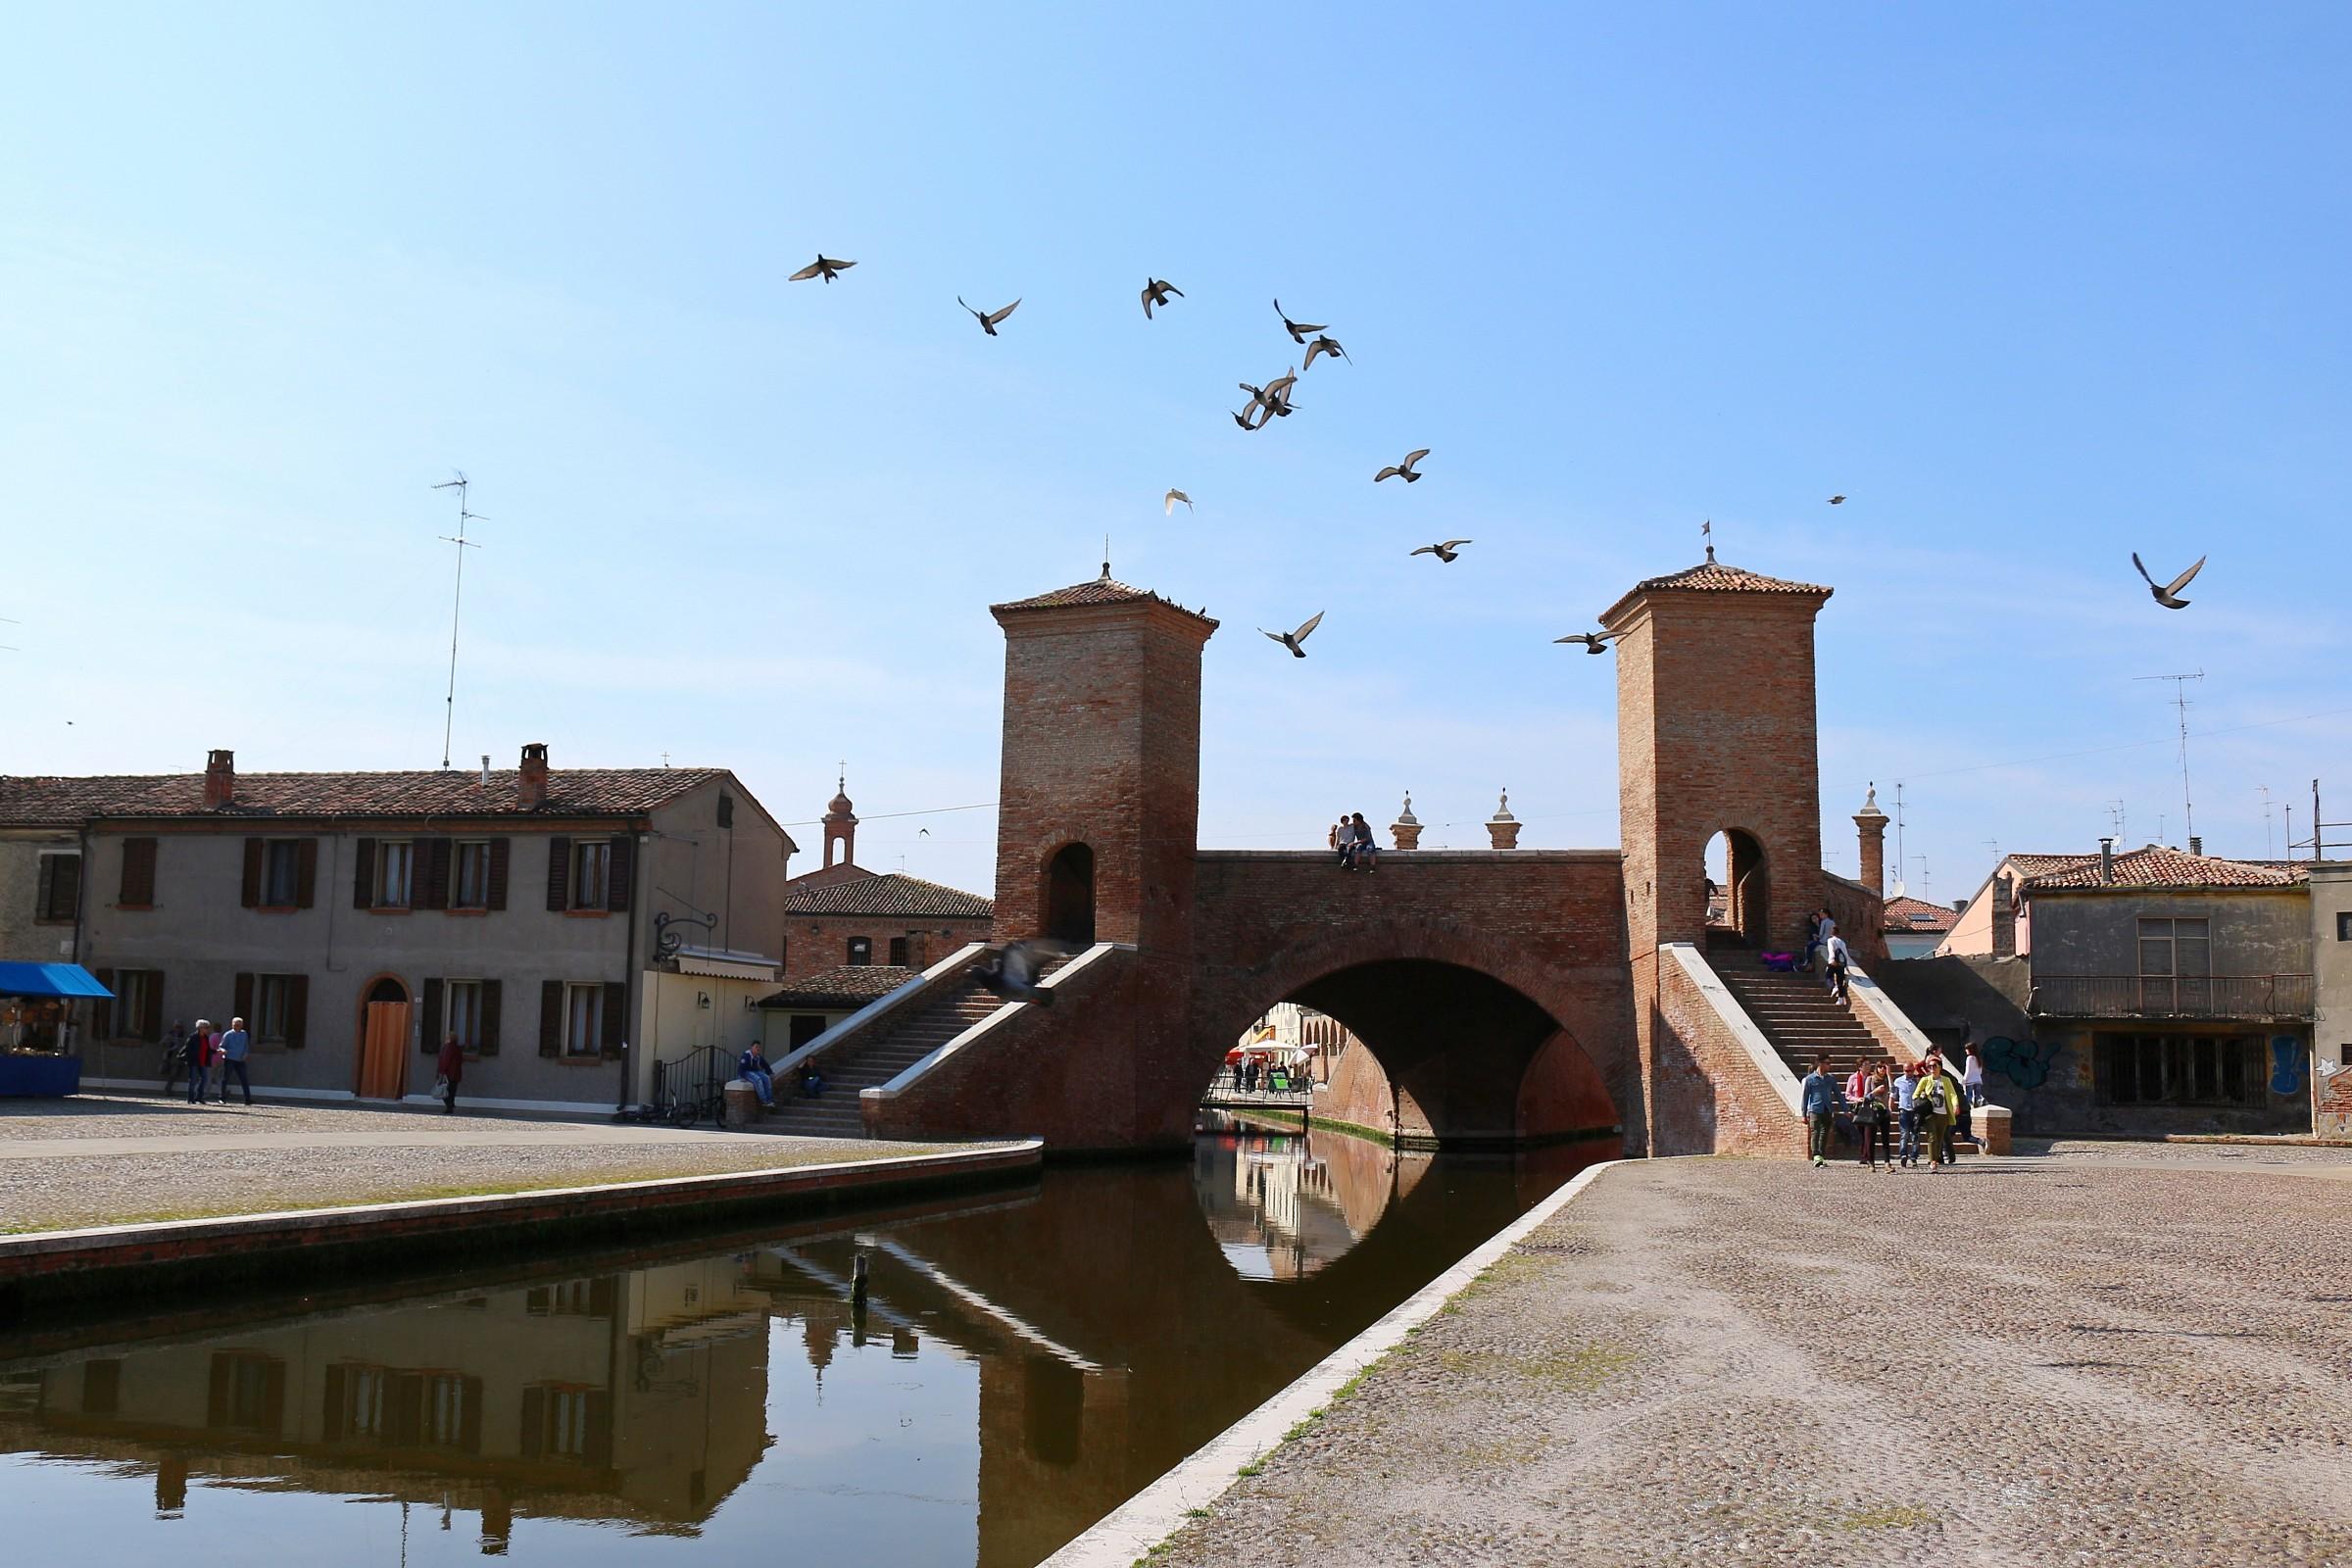 Trepponti & birds...